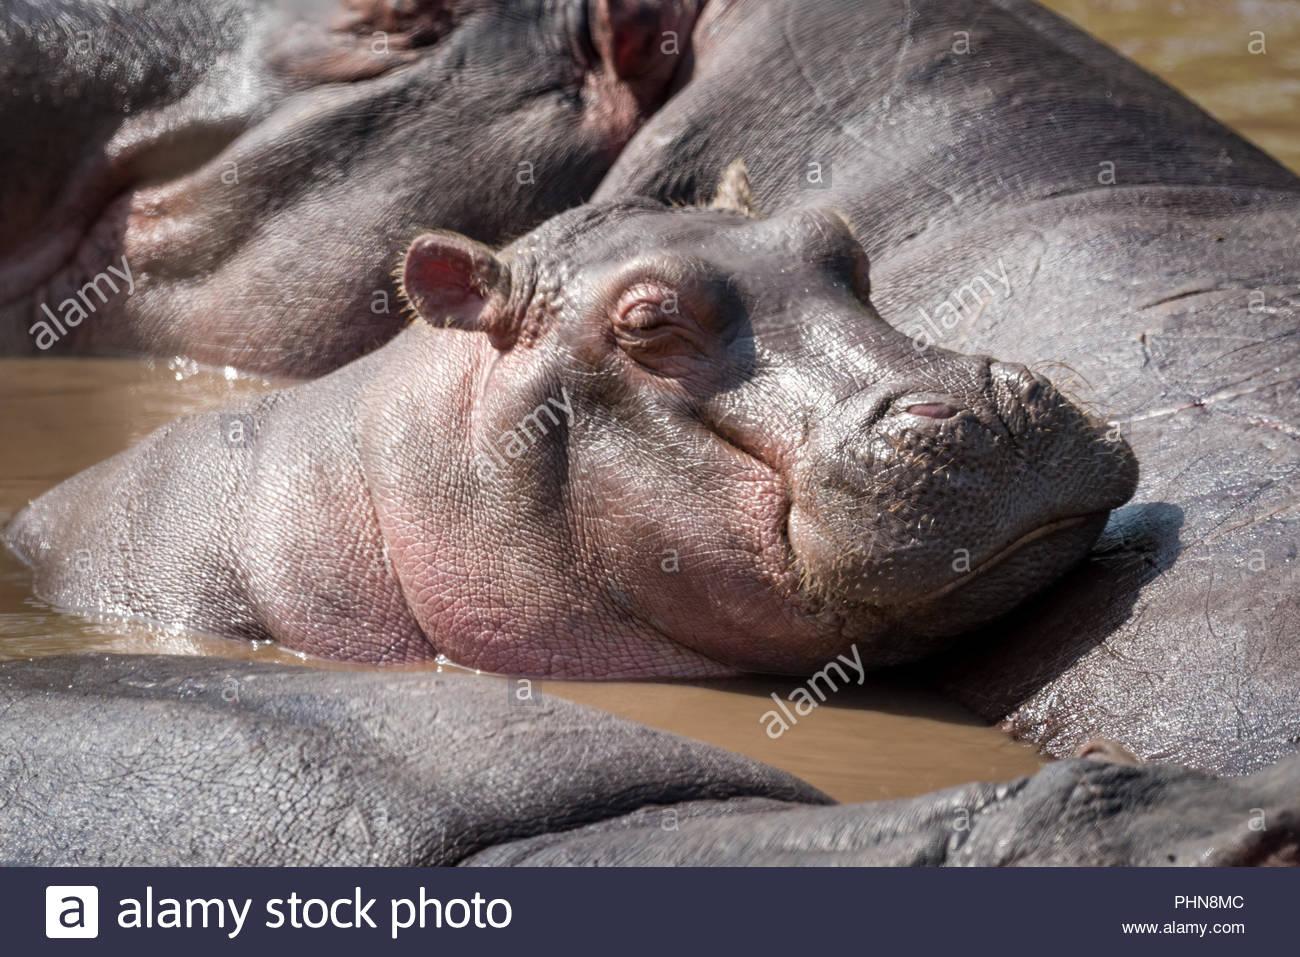 Hippopotamus dozing on another in muddy pool - Stock Image